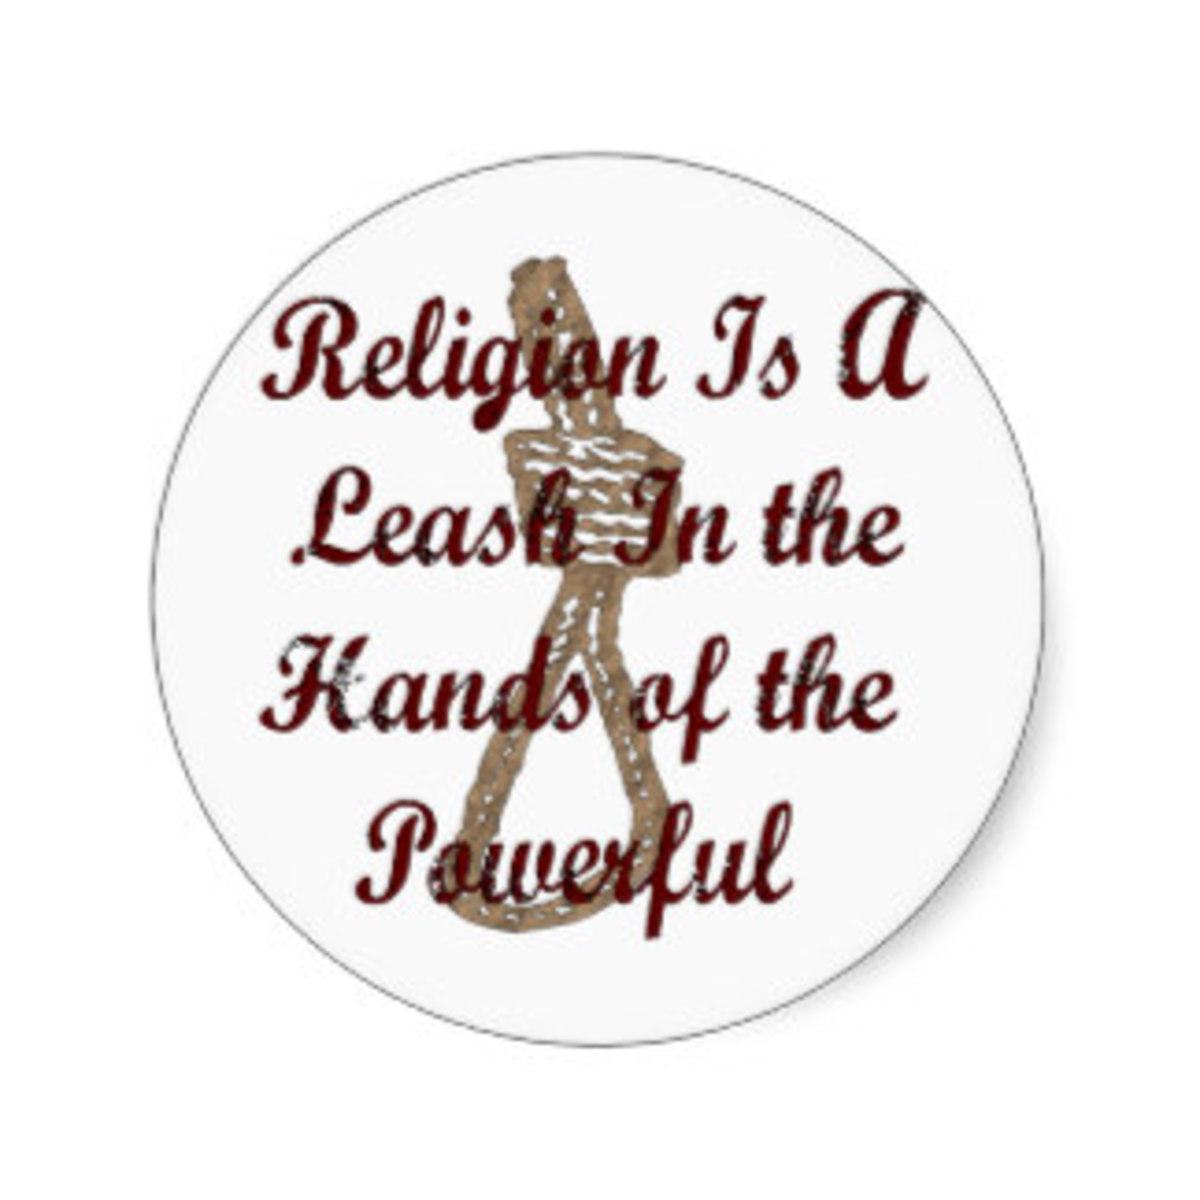 the-kingdom-of-the-pastors